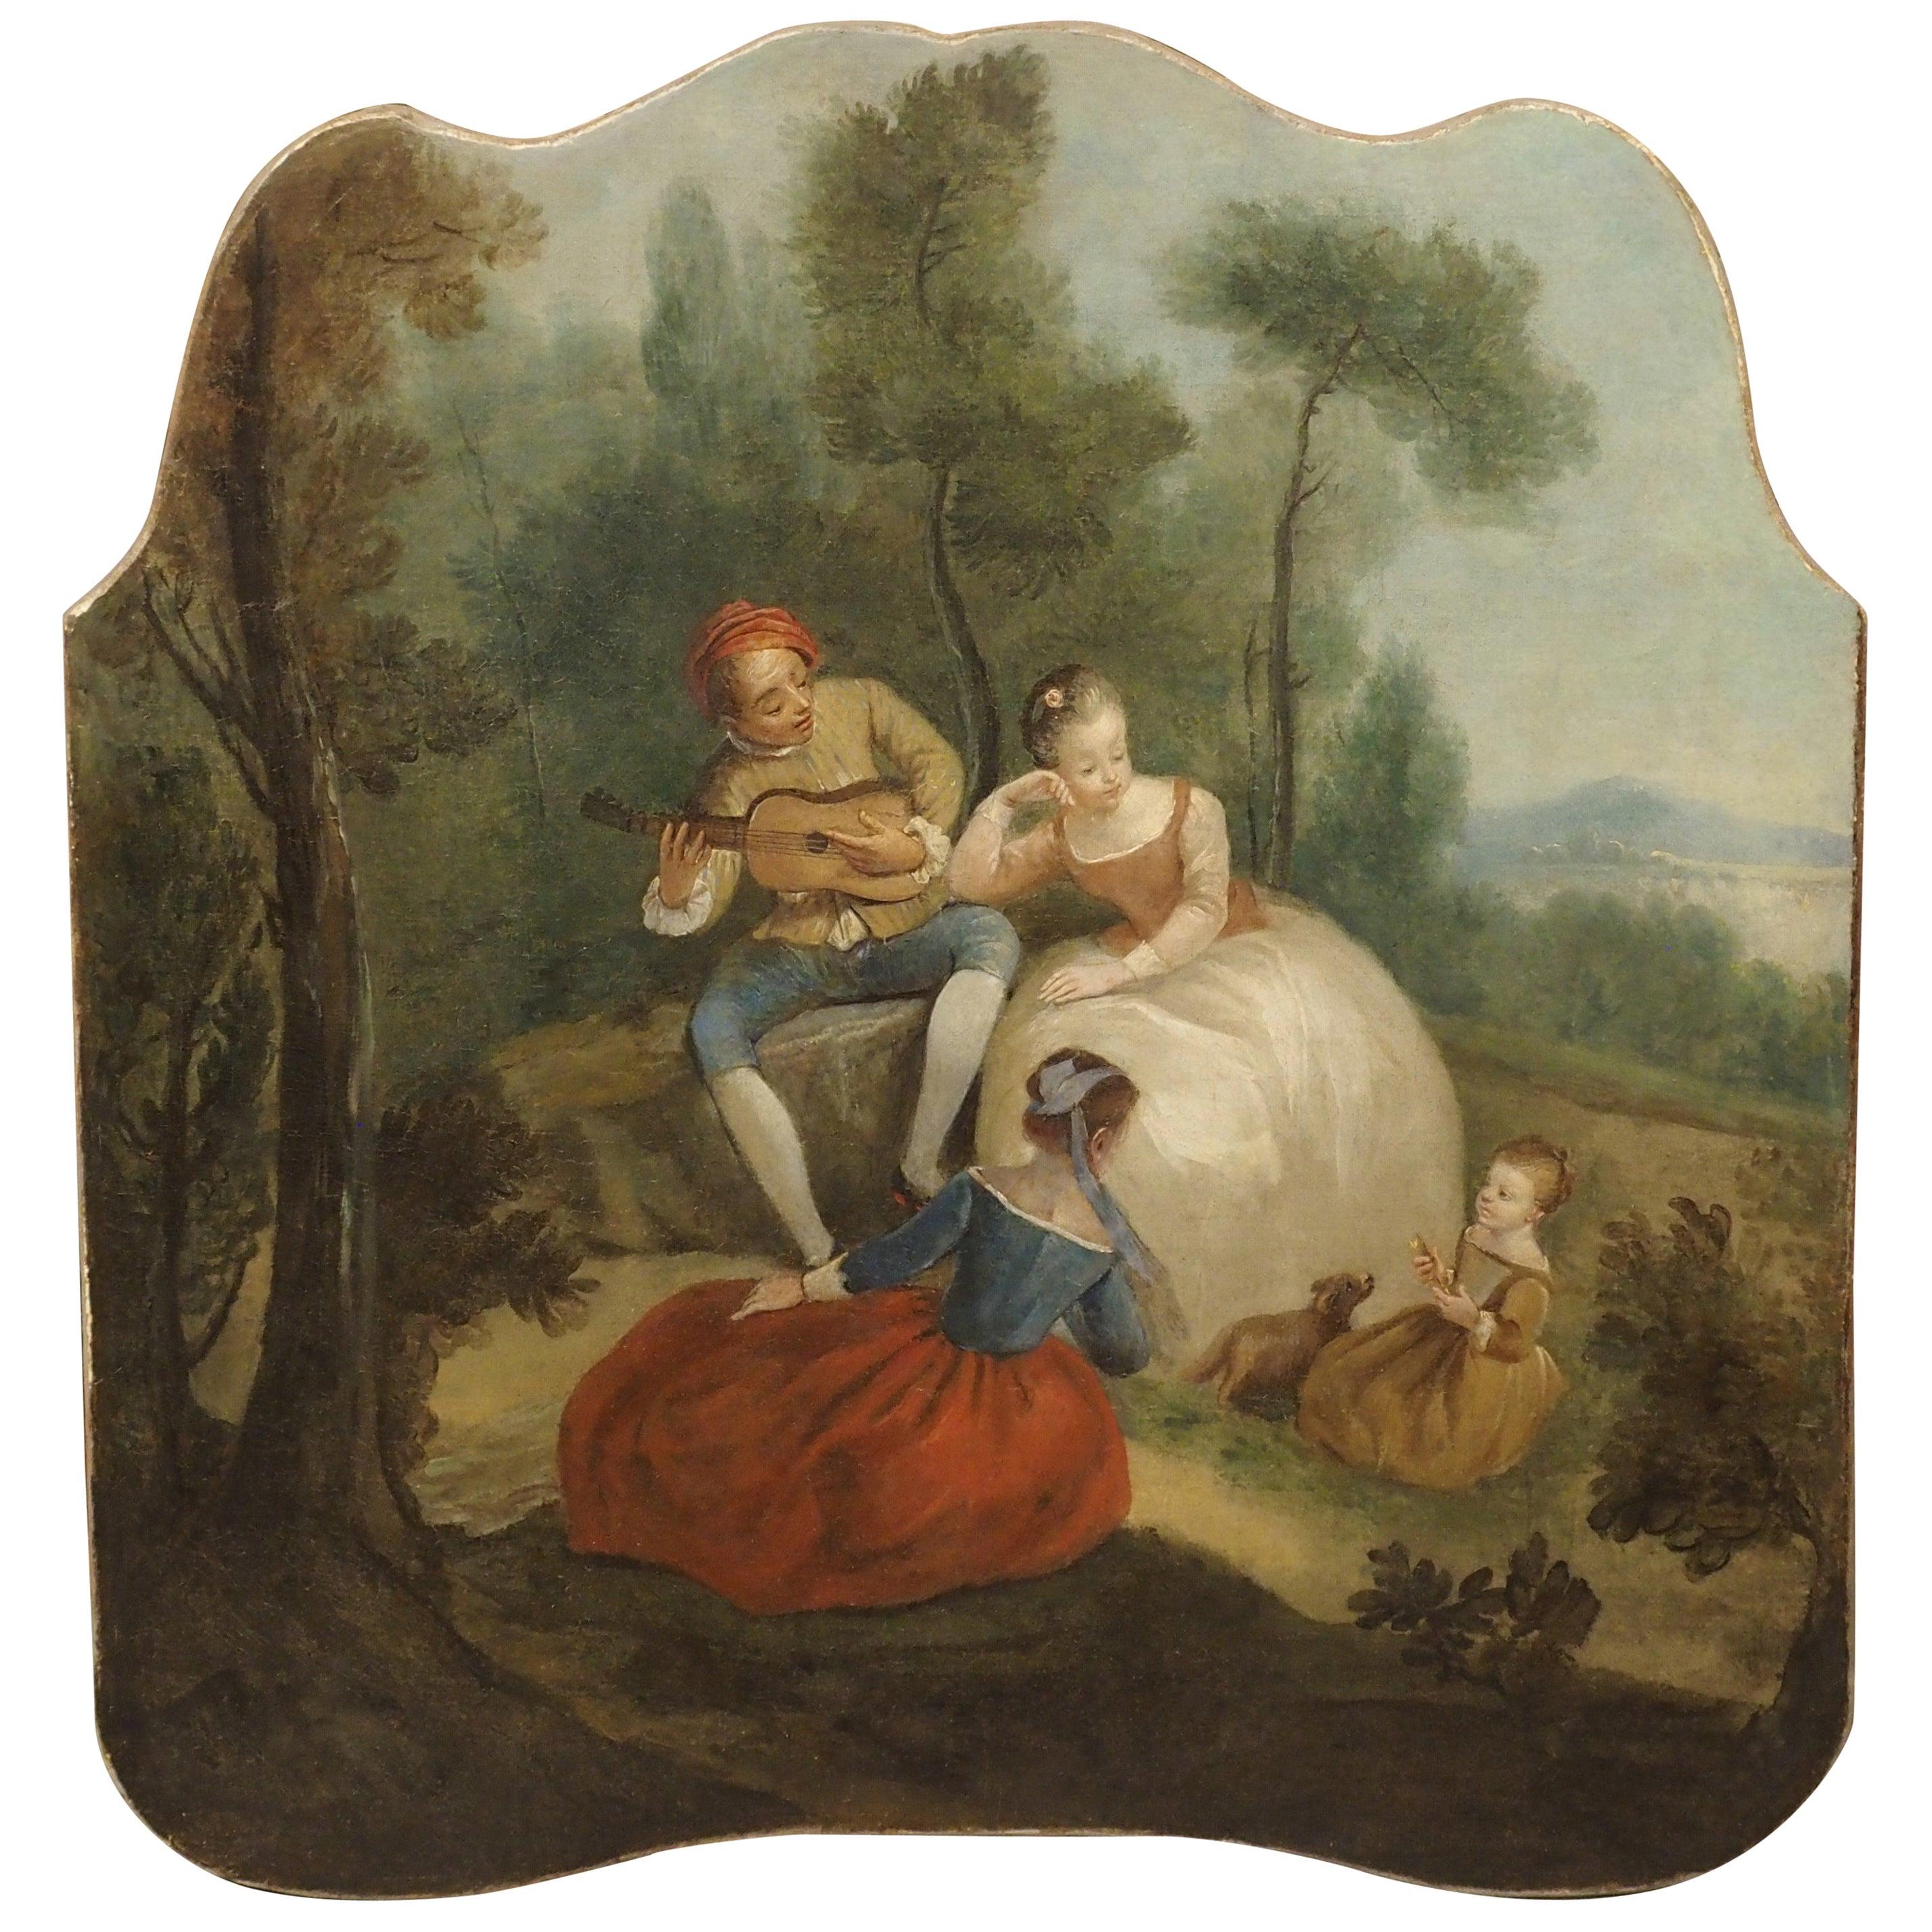 18th Century French Genre Scene Overdoor Painting, circa 1770